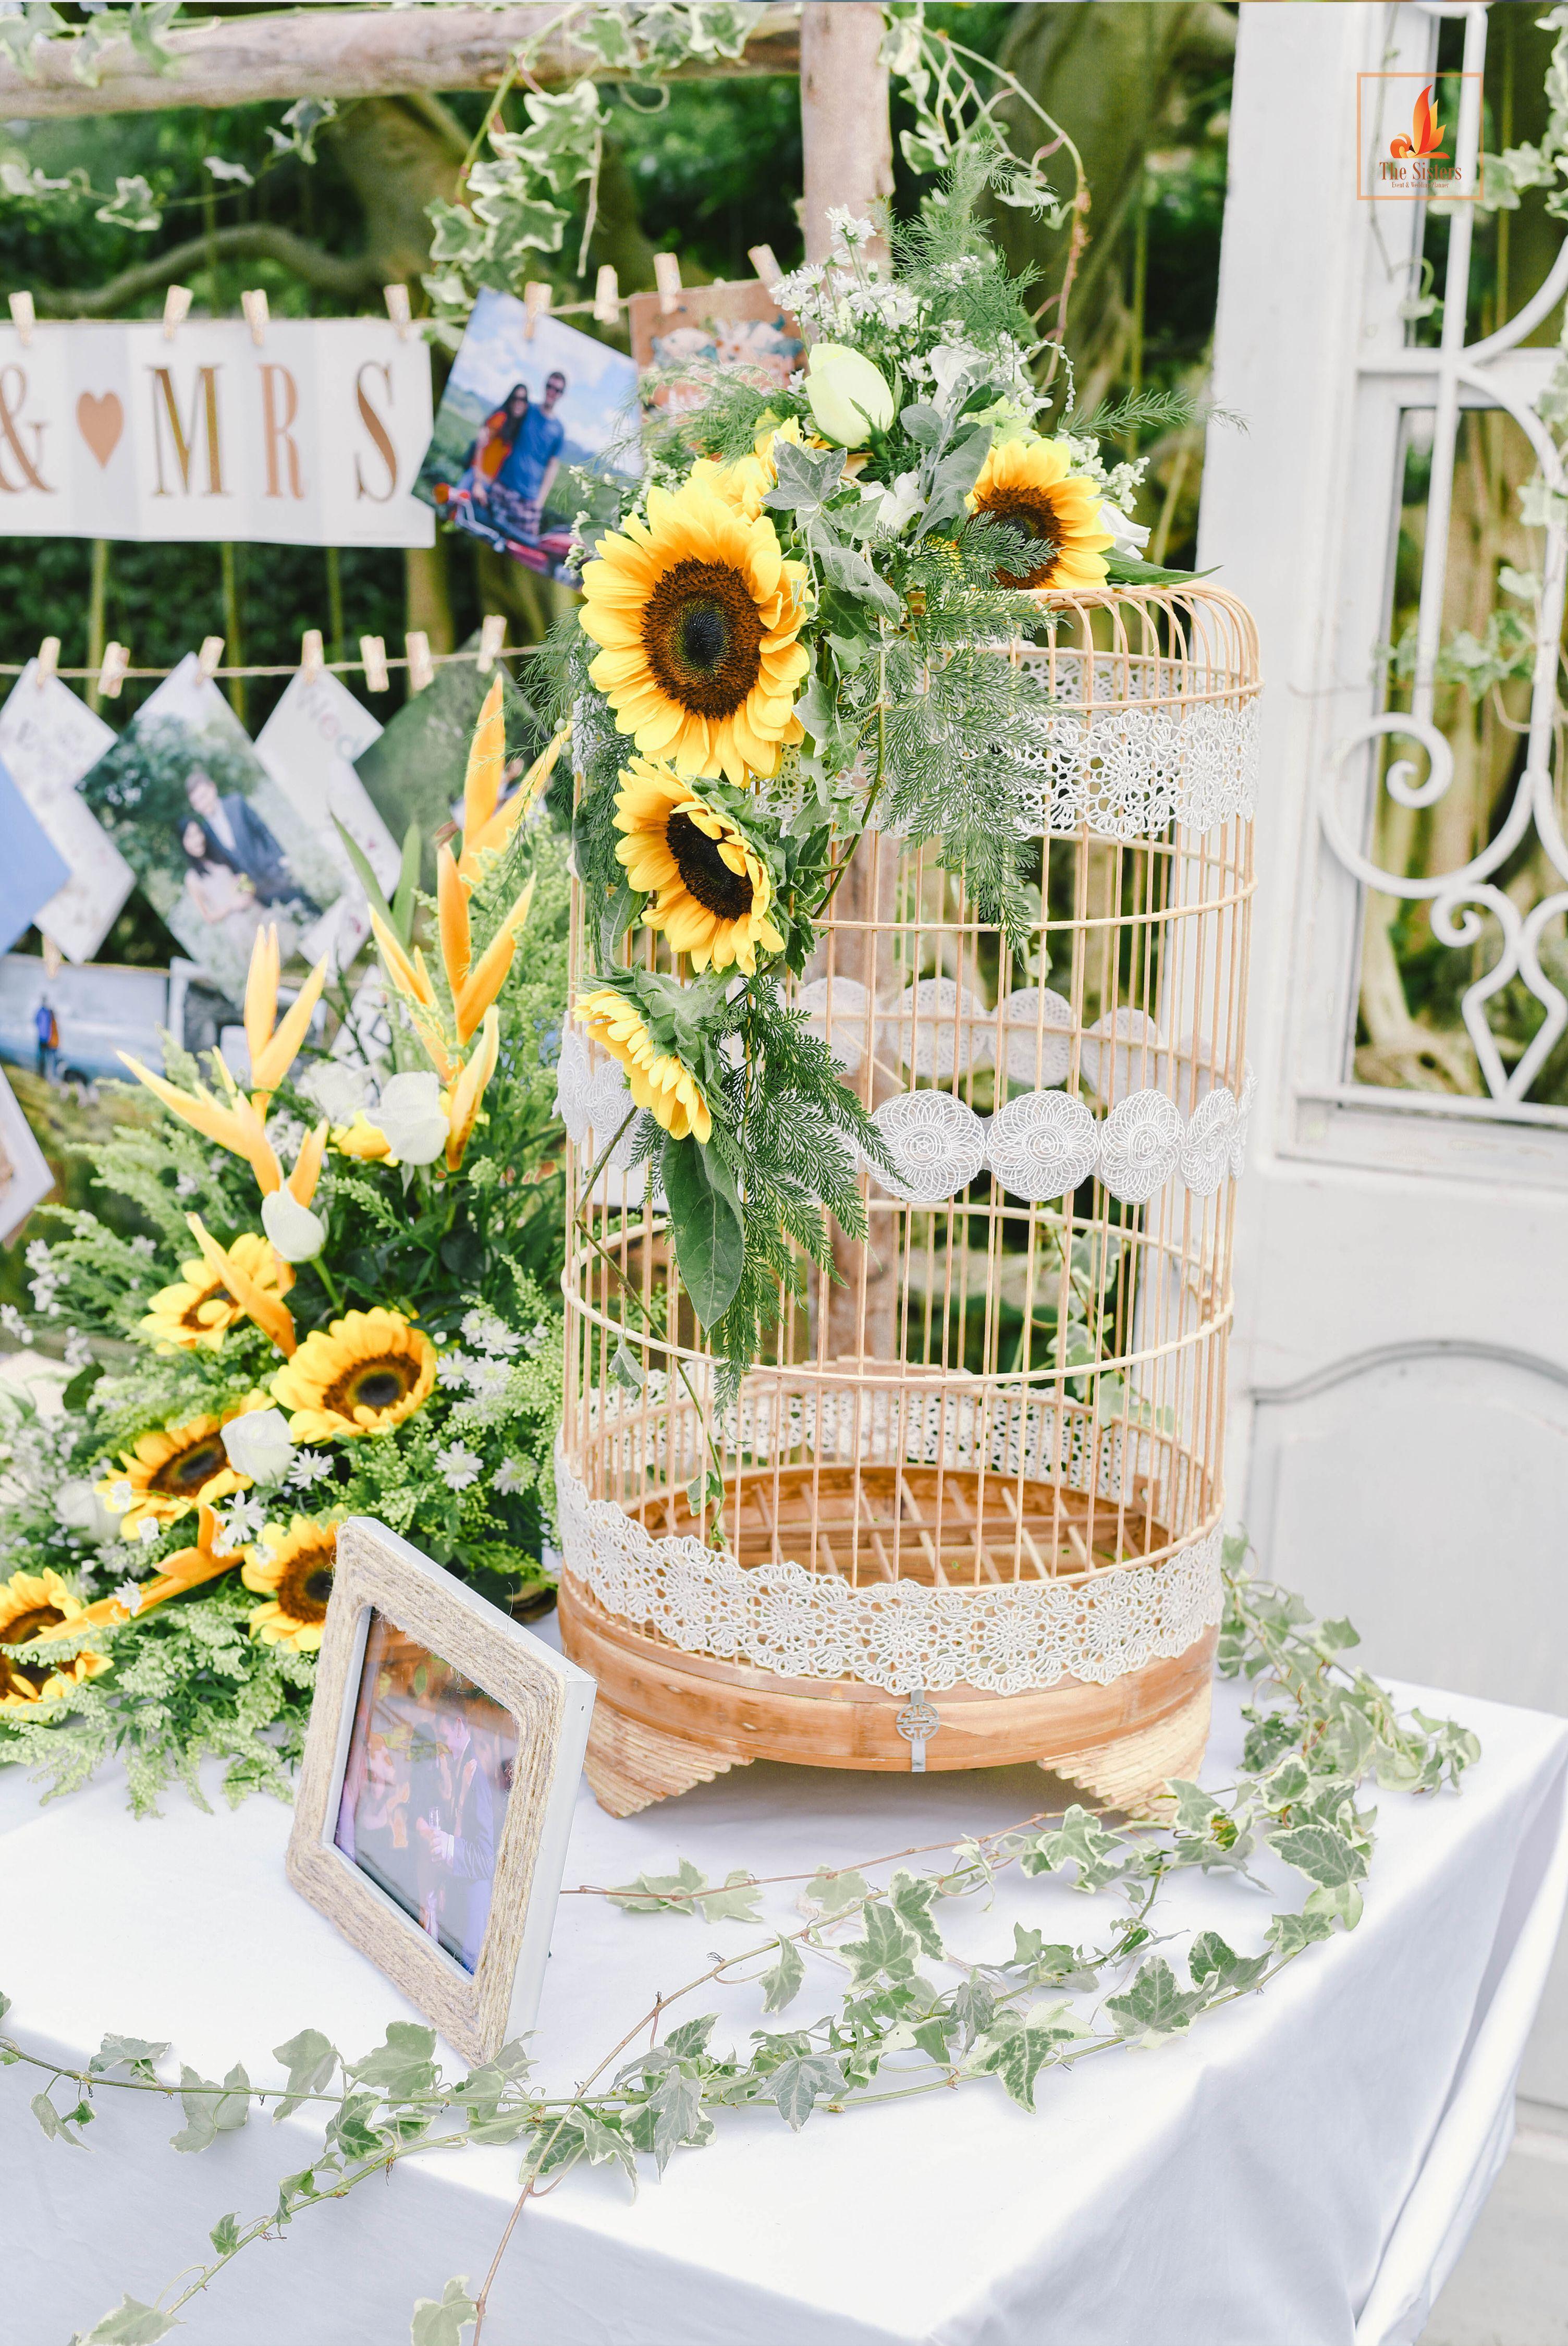 Rustic sunflower wedding in hanoi vietnam wedding planner the rustic sunflower wedding in hanoi vietnam wedding planner the sisters wedding decoration team junglespirit Image collections